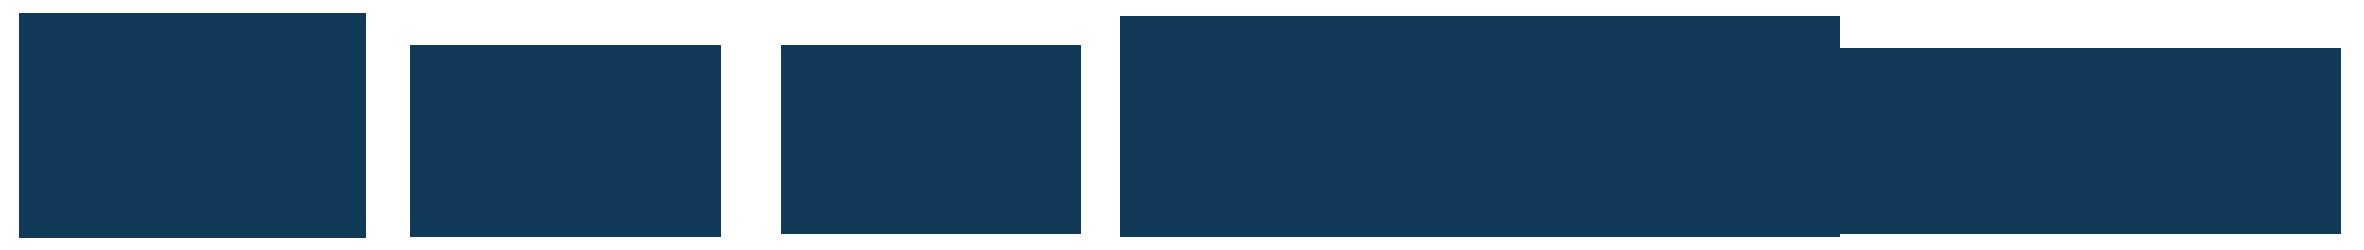 CochranWealth-logo2-thin.png